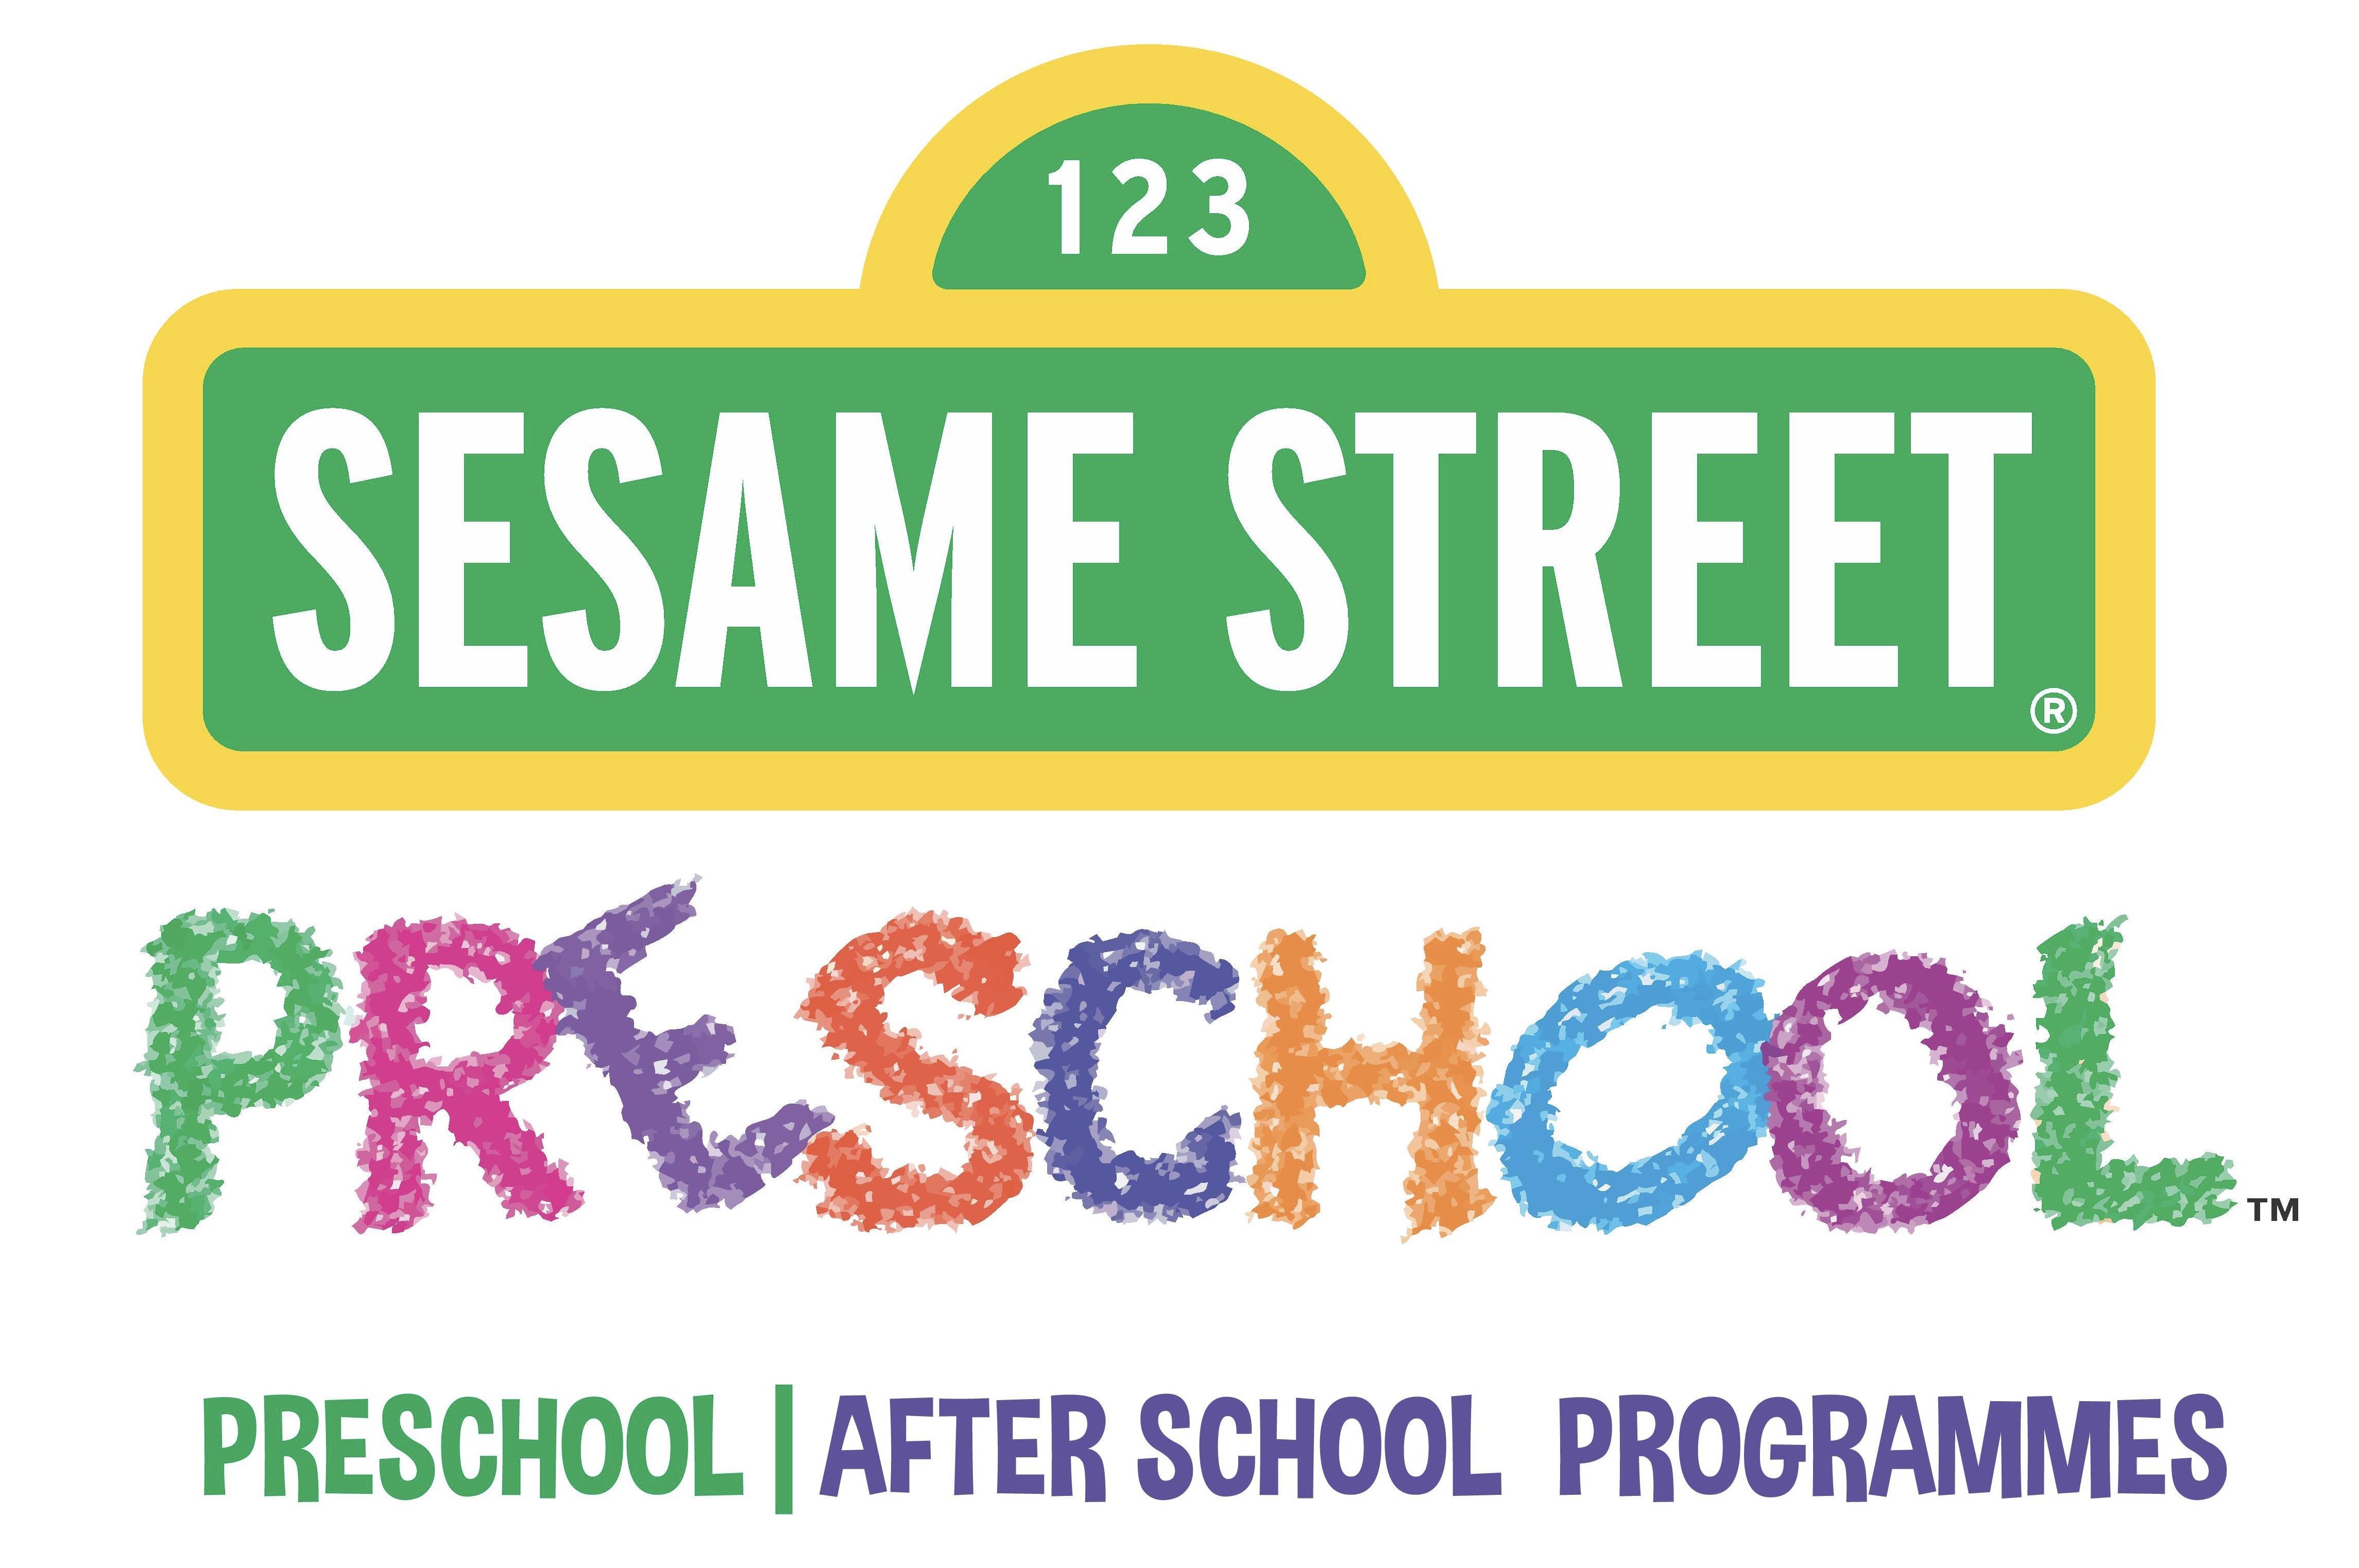 Sesame street hsr layout bangalore reviews sesame street hsr sesame street hsr layout bangalore image reheart Choice Image